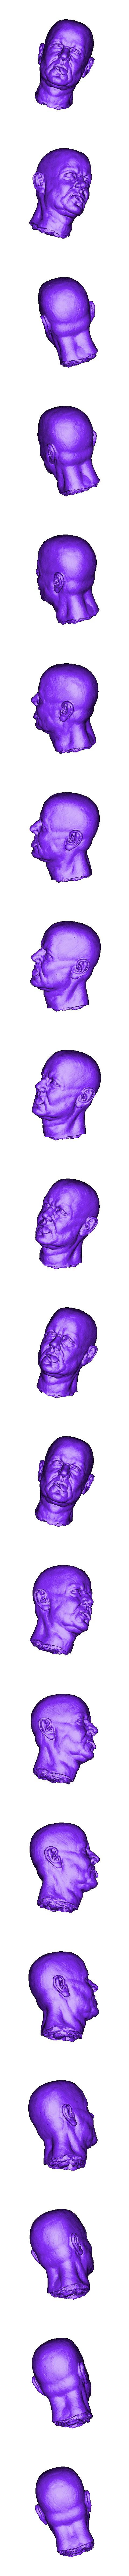 Head_repaired.stl Download free STL file Soul Reaper demon hunter • 3D print object, Boris3dStudio